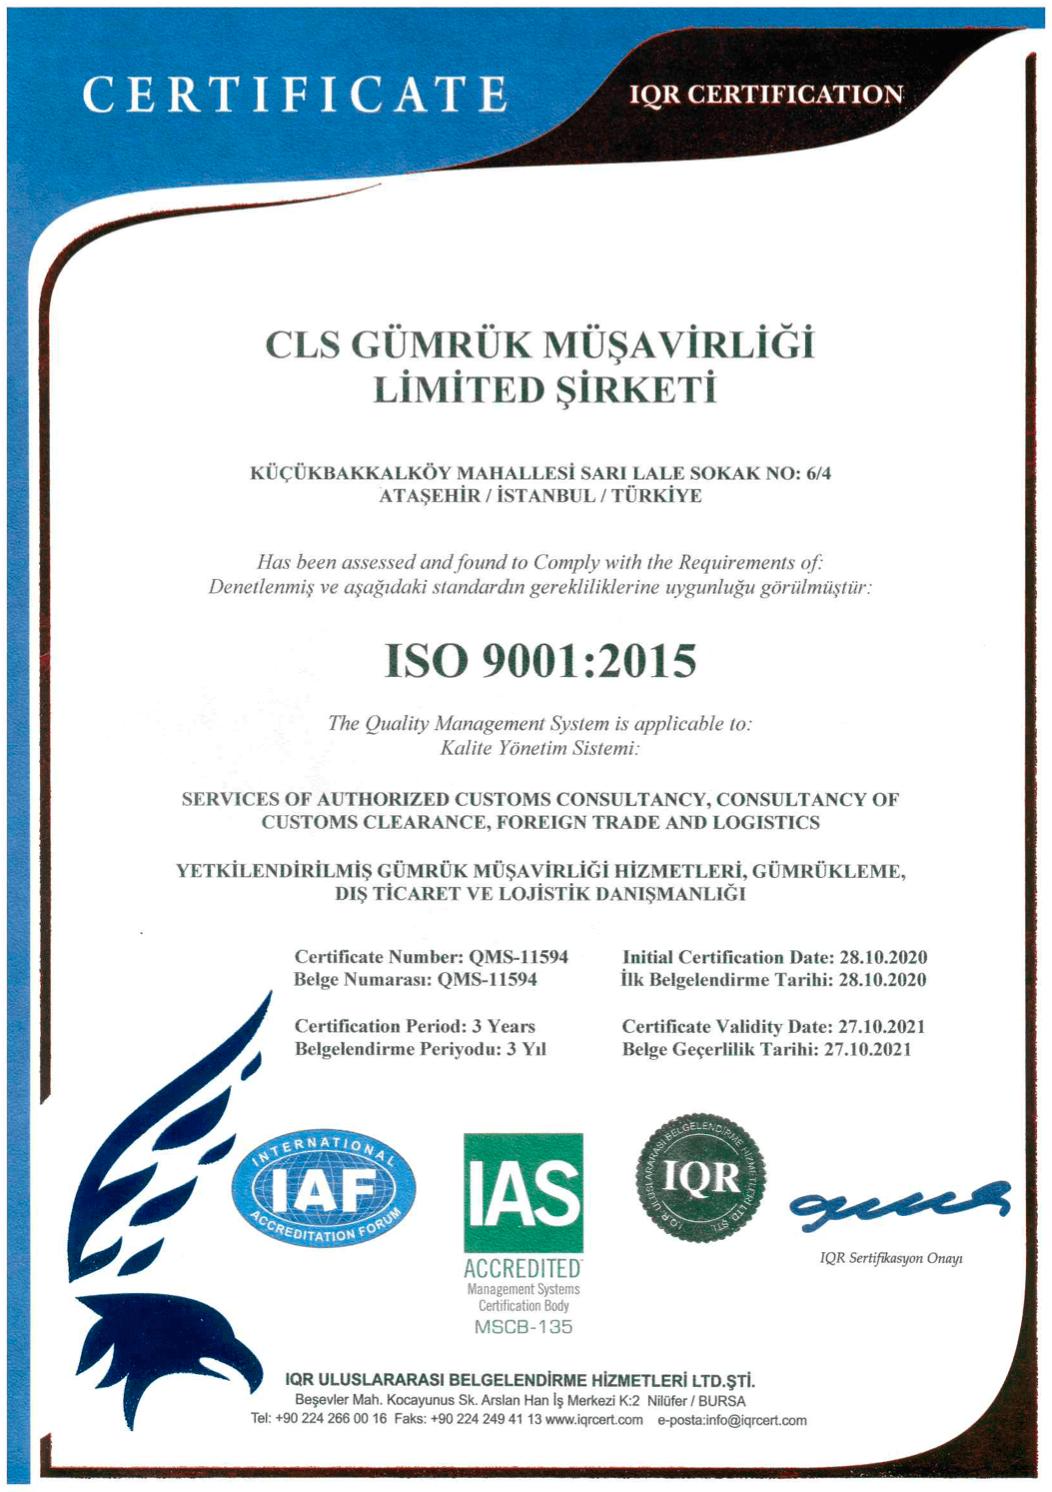 sertifika2a